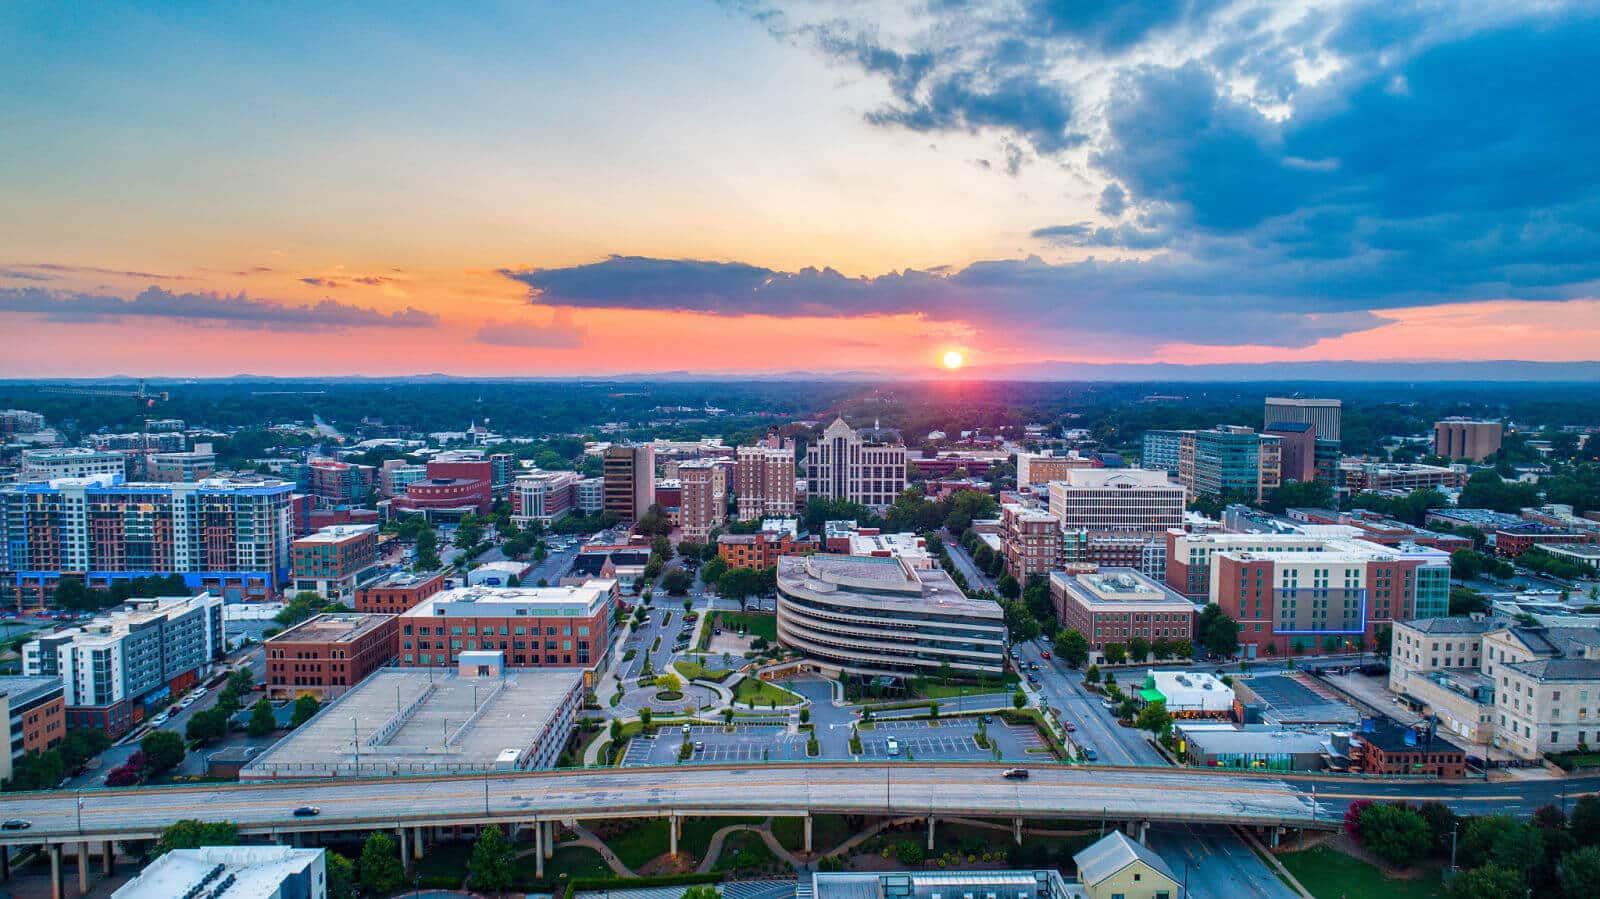 Greenville South Carolina Skyline at Sunset